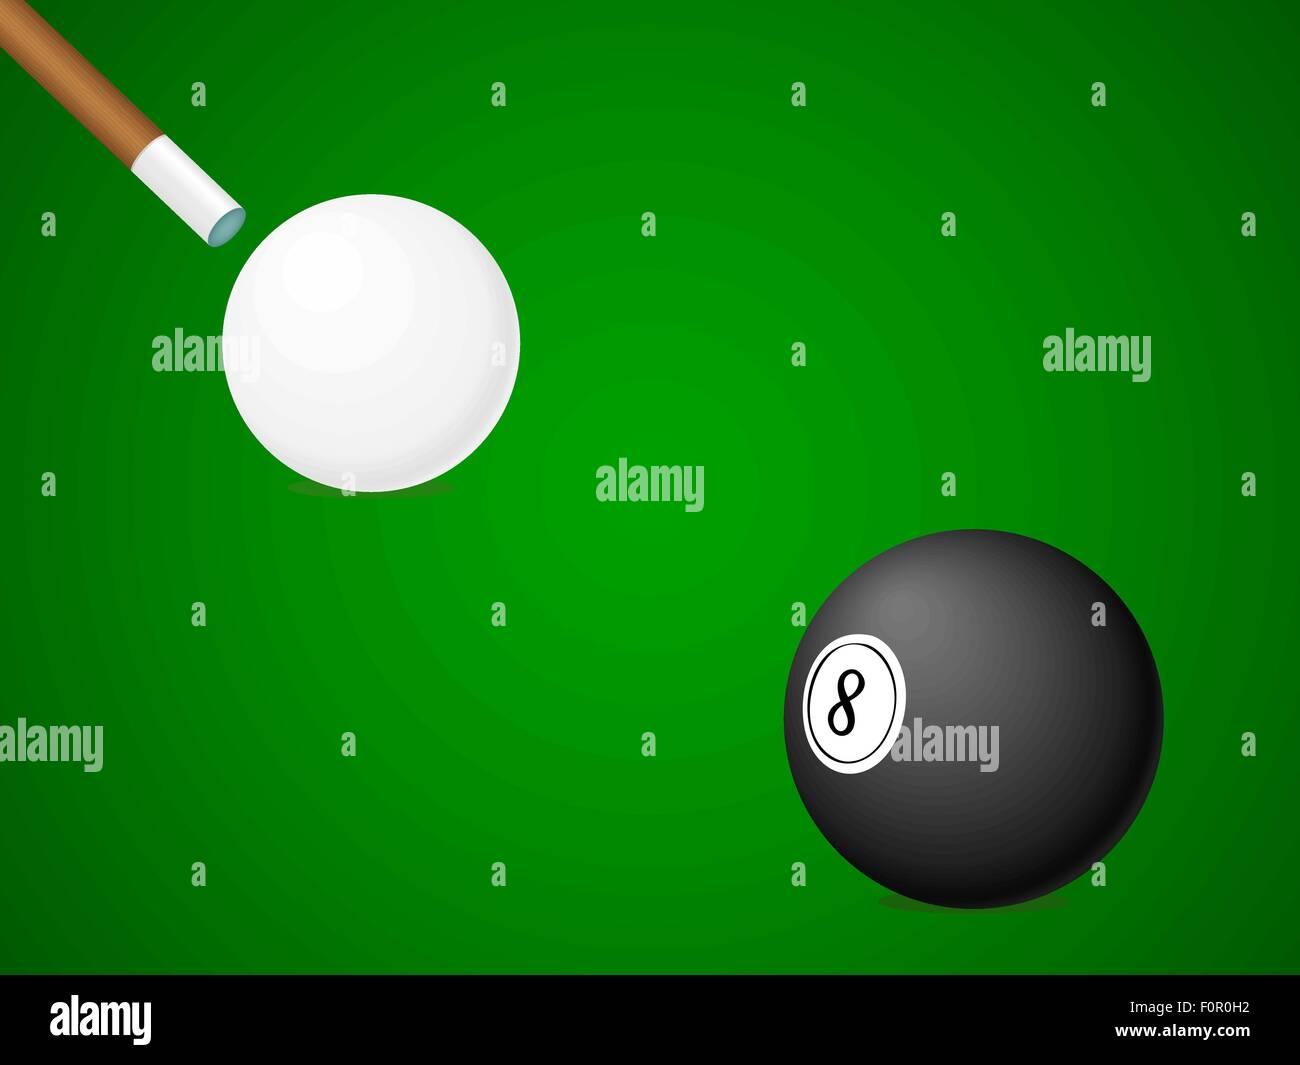 White and black billiard ball and stick. Vector illustration. - Stock Vector